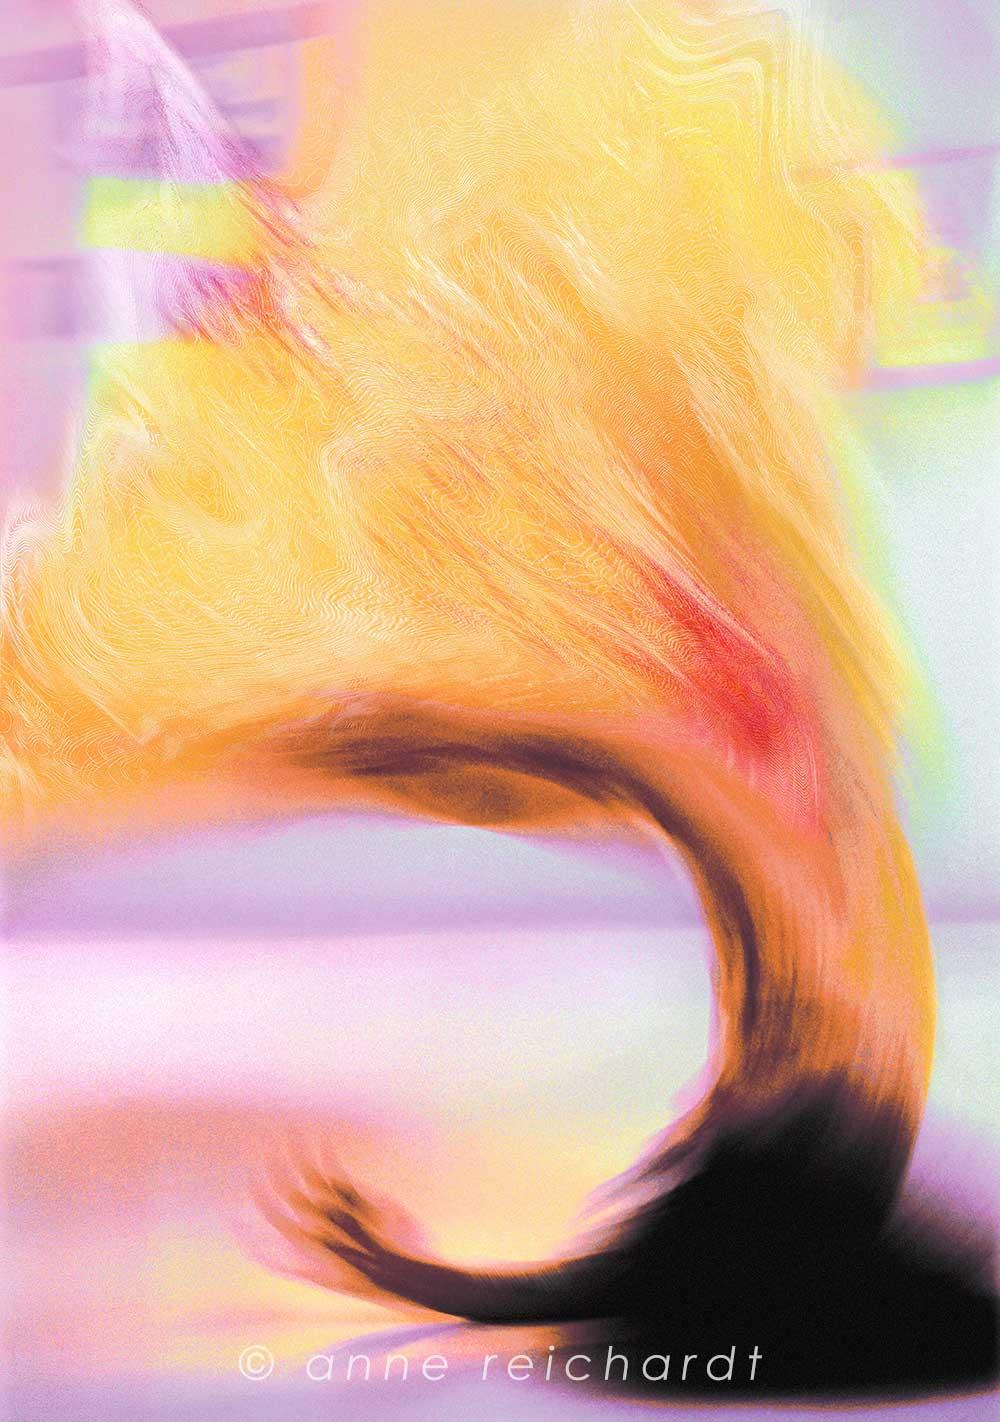 07-breaking-free-jpeg.jpg